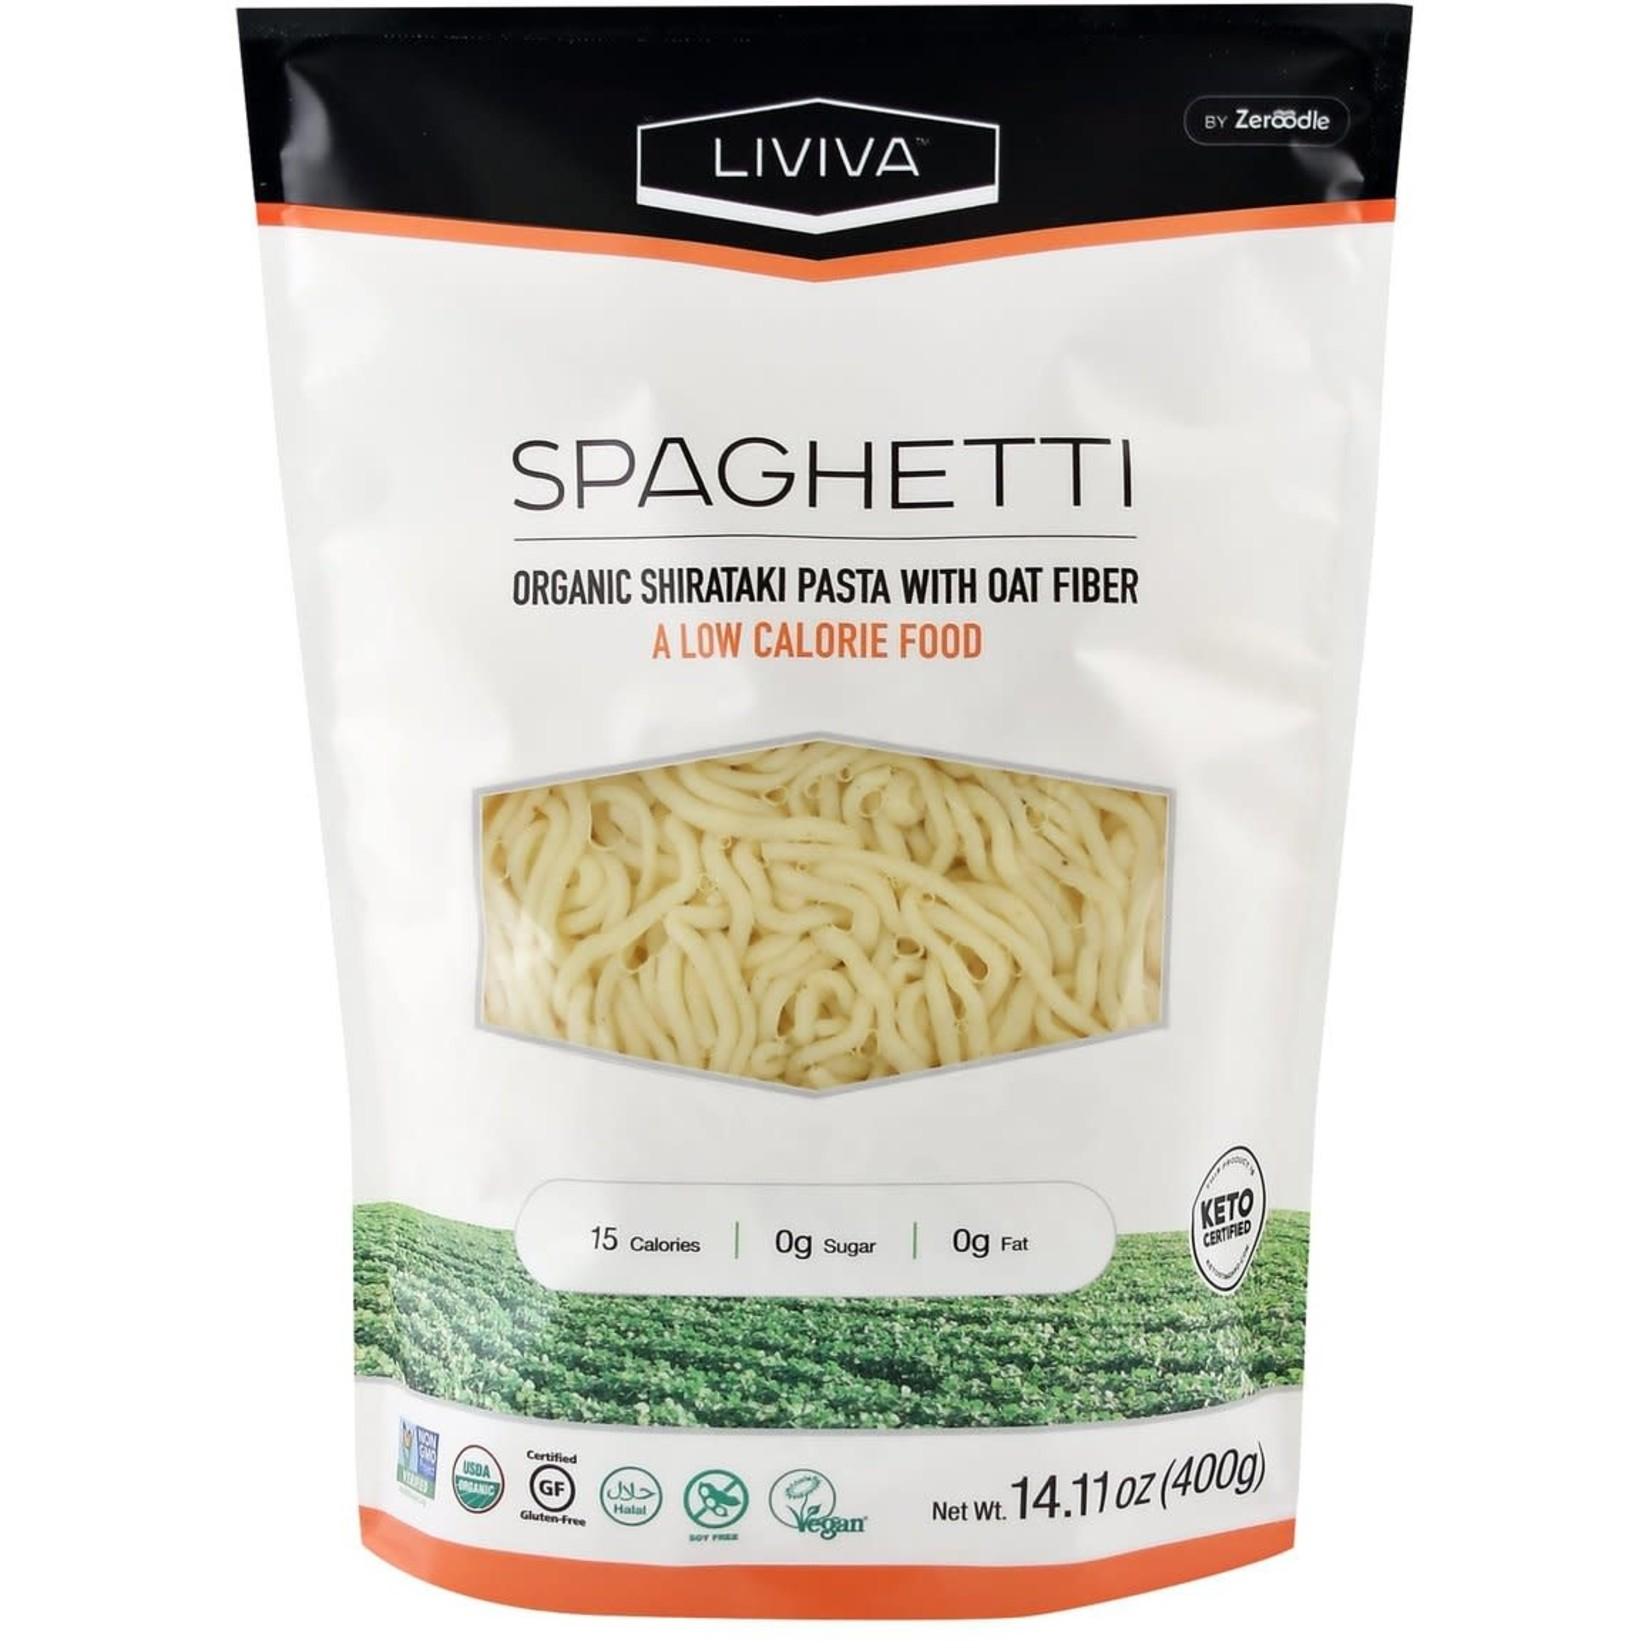 Liviva Liviva Shirataki Spaghetti with Oat Fiber